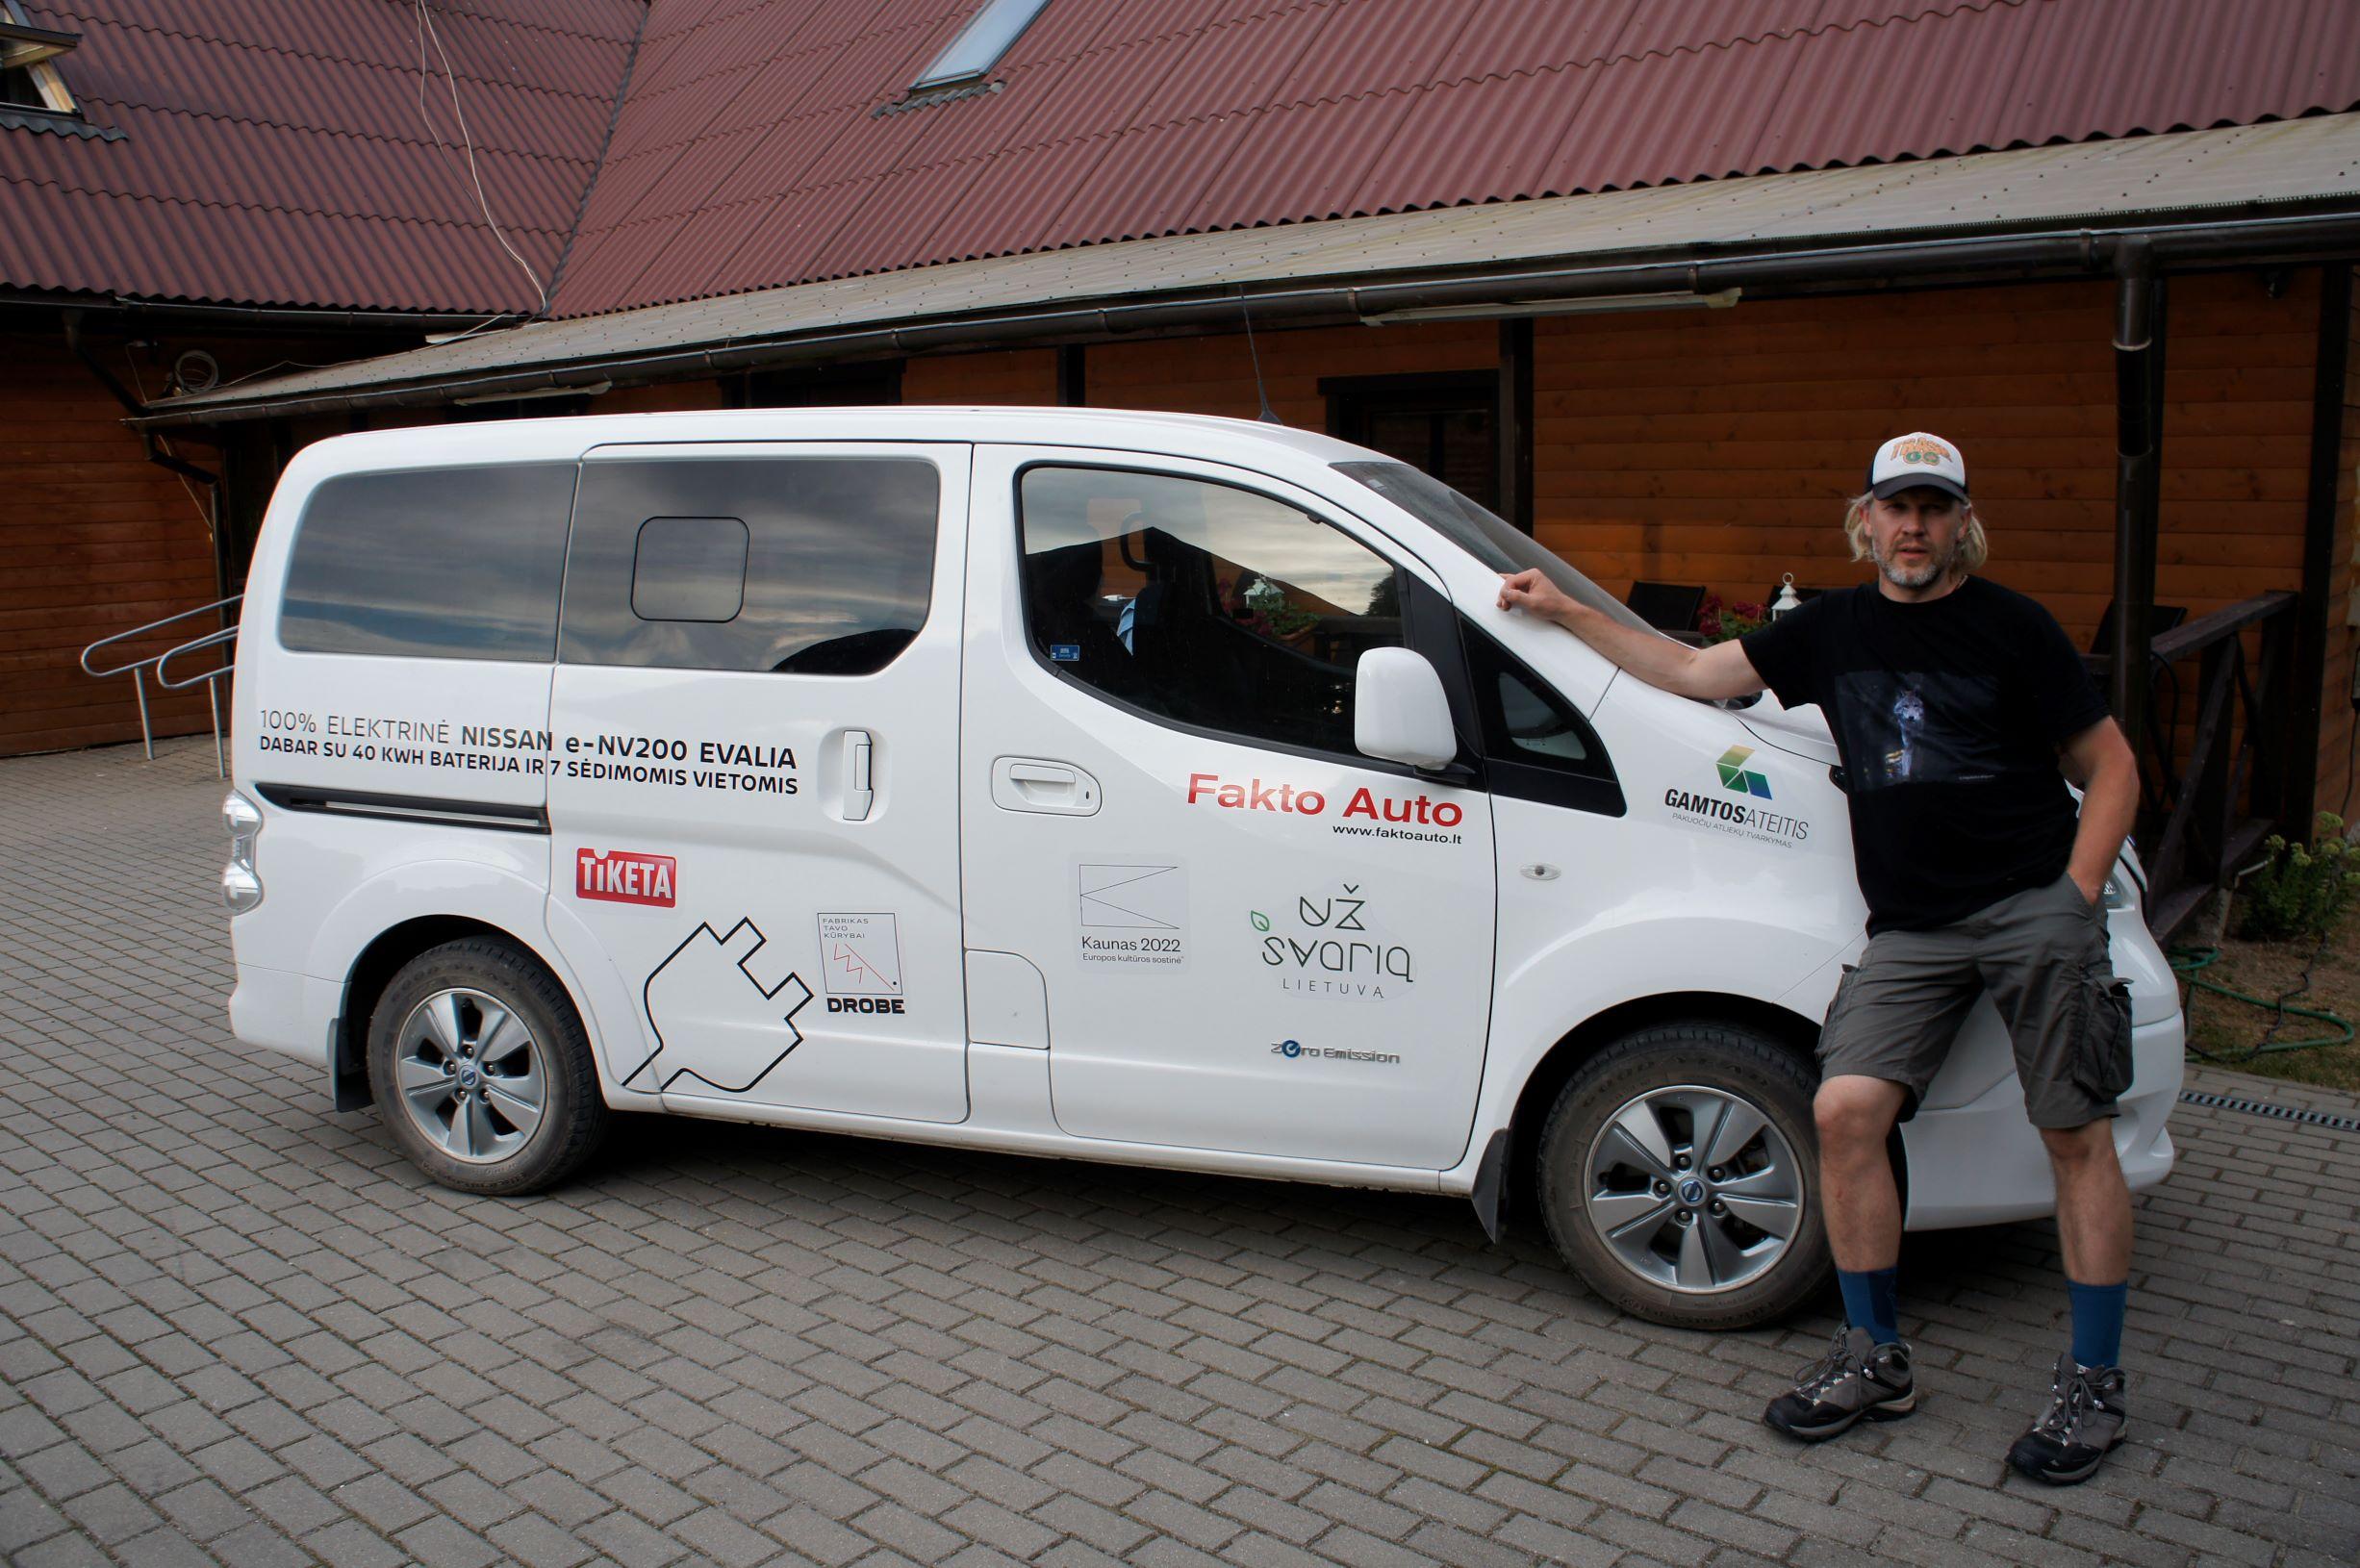 Ekologinio žygio palydovas – elektra varomas furgonas Nissan env200 iš Fakto Auto